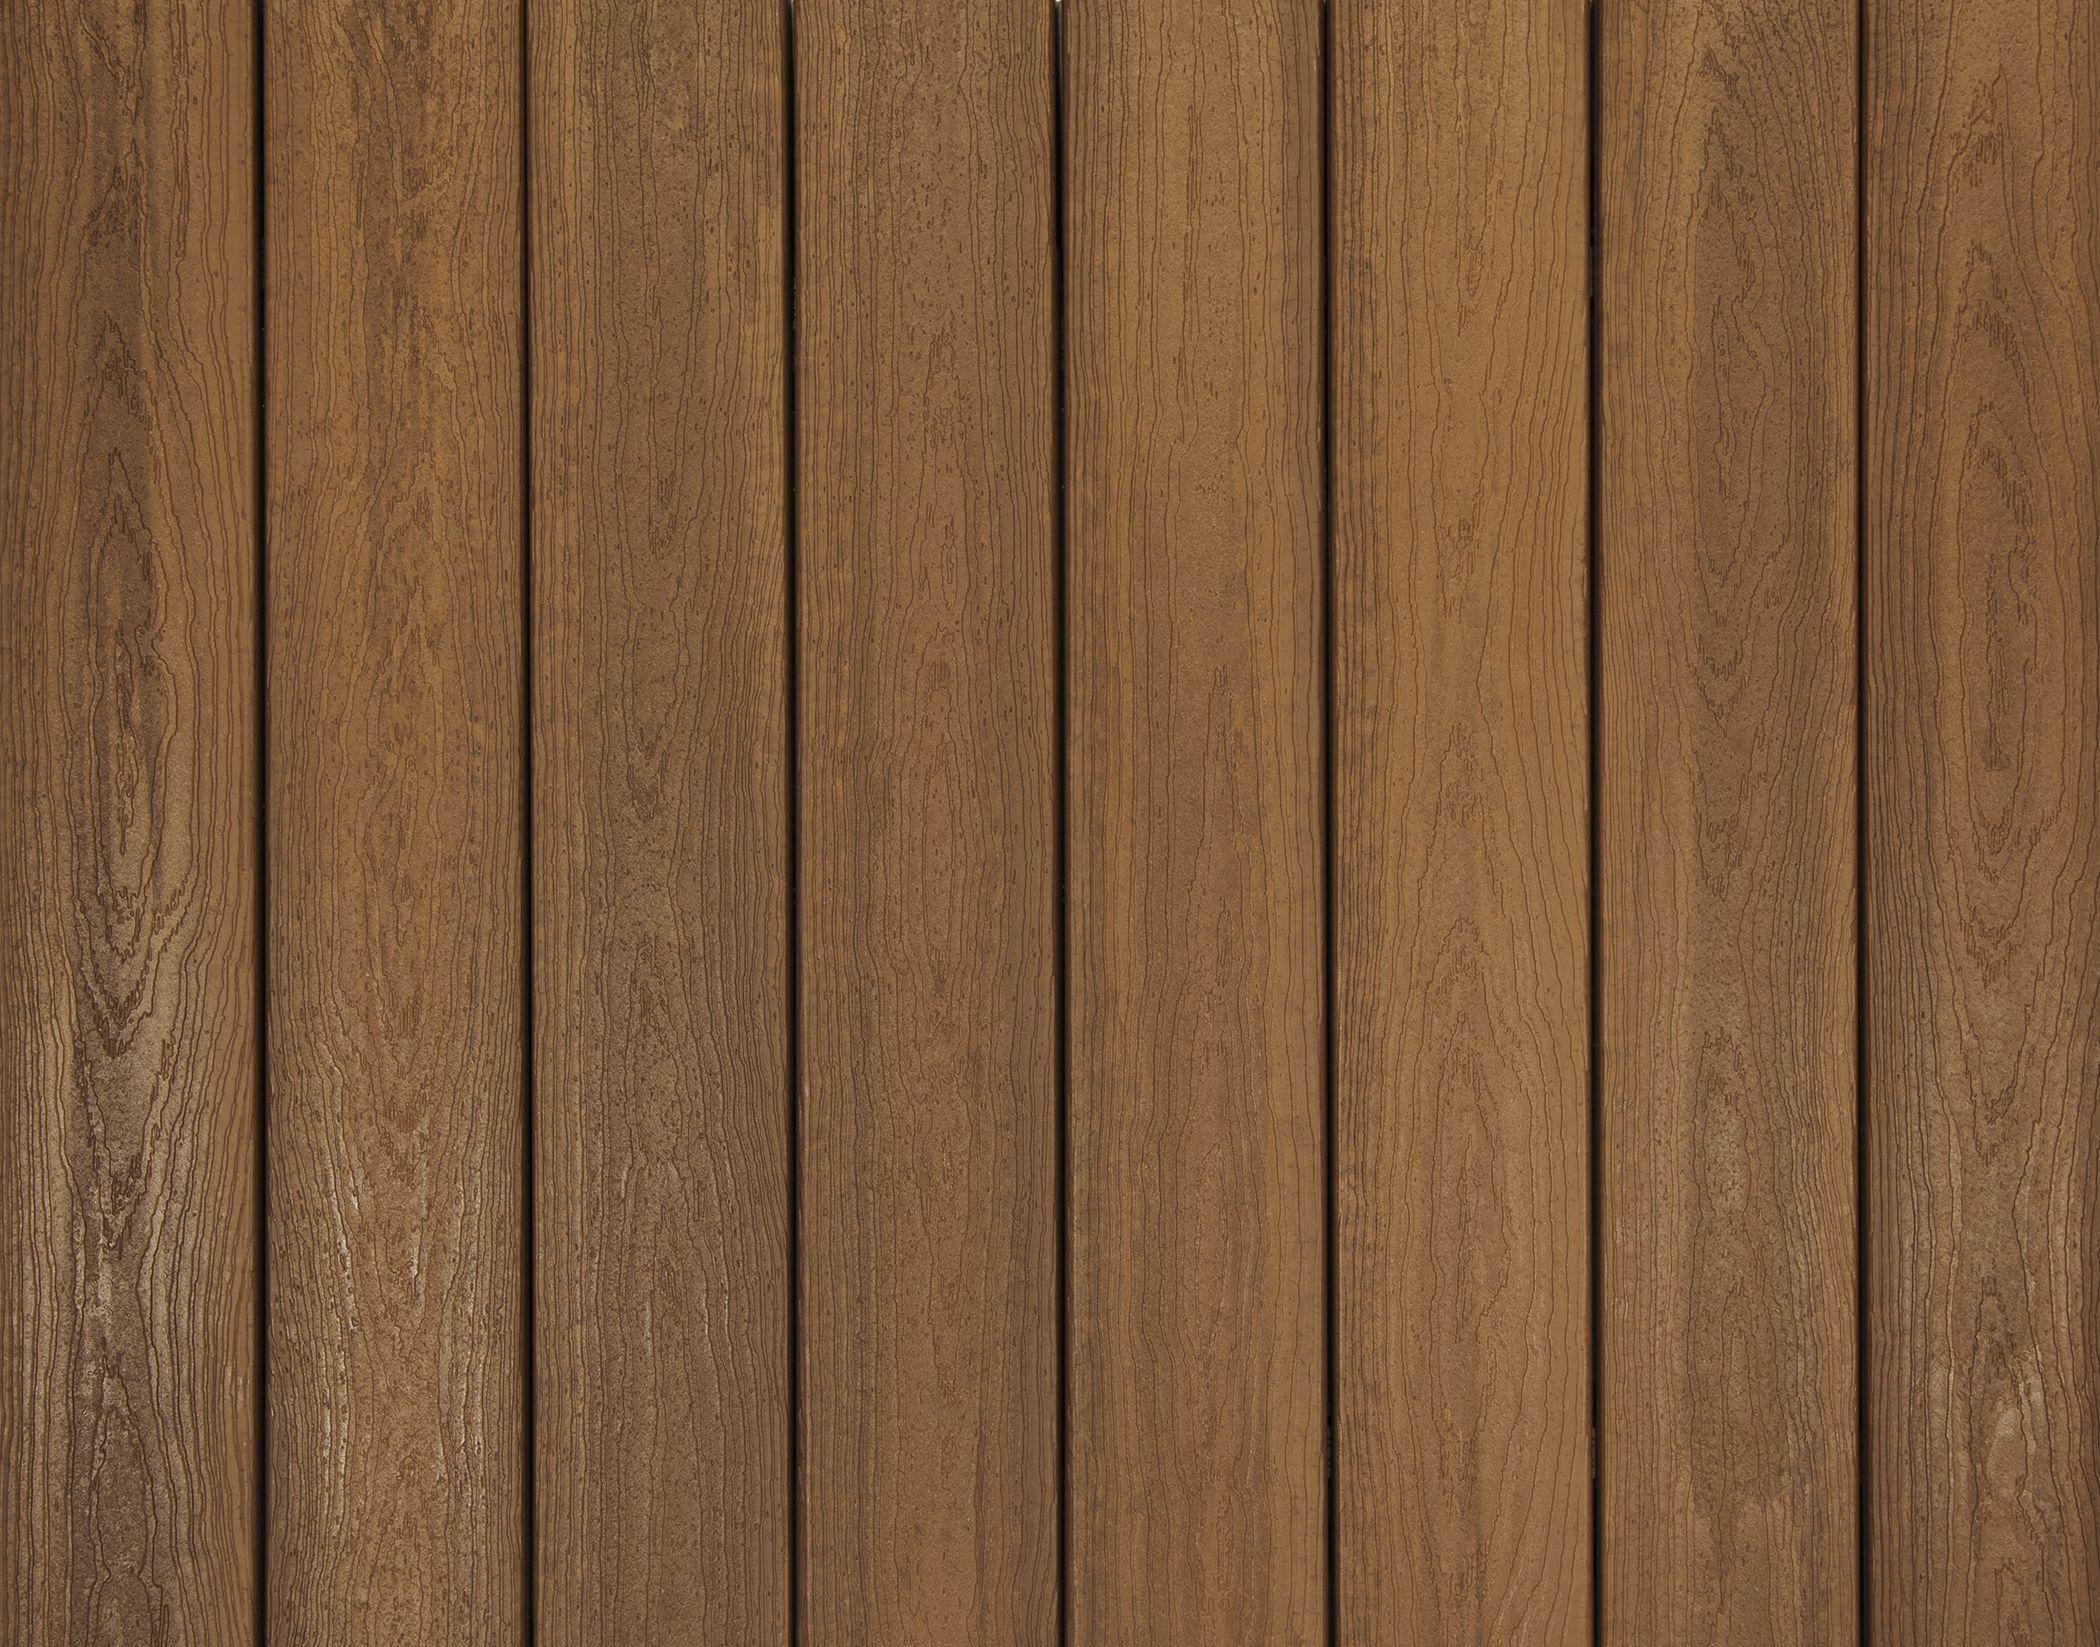 Free Photo Deck Wood Weathered Wood Texture Free